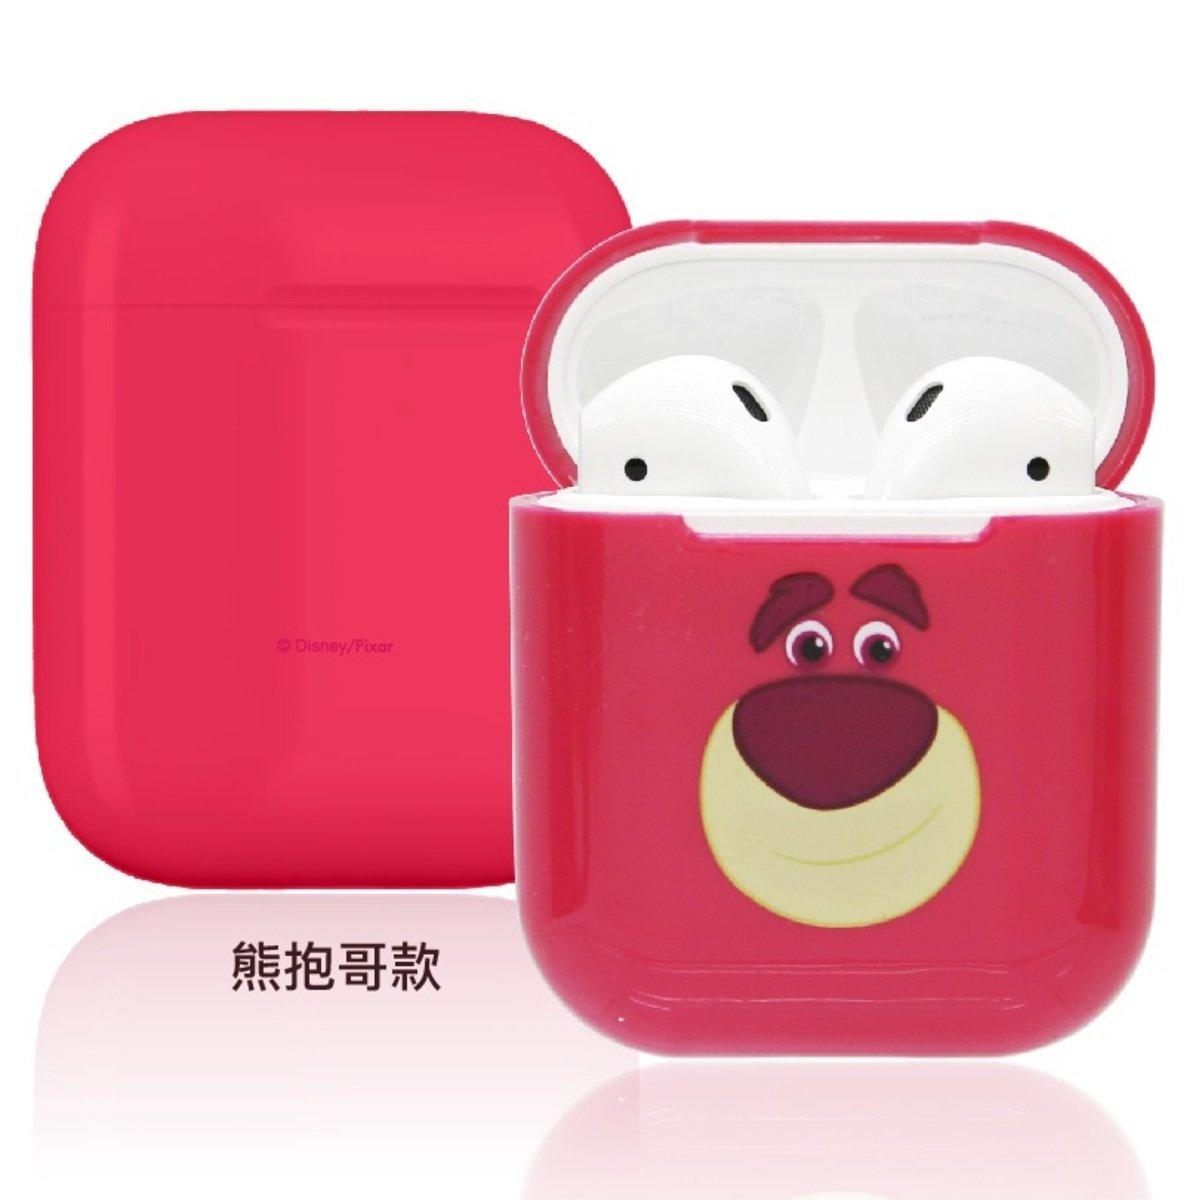 Disney AirPods充電盒保護殼 勞蘇款